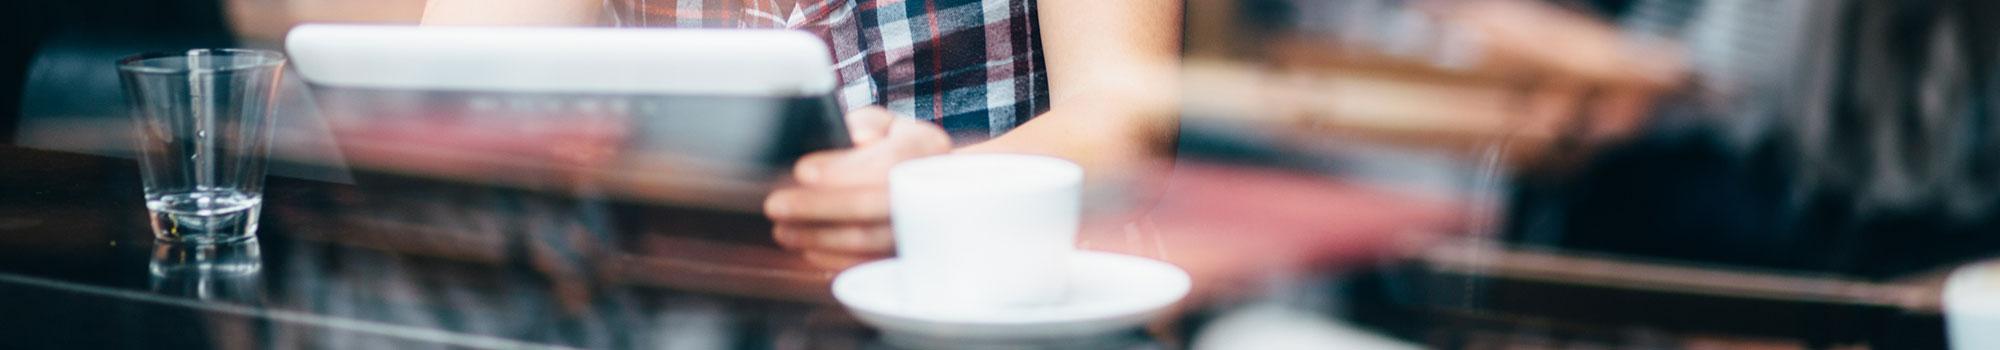 header_kaffeeautomaten